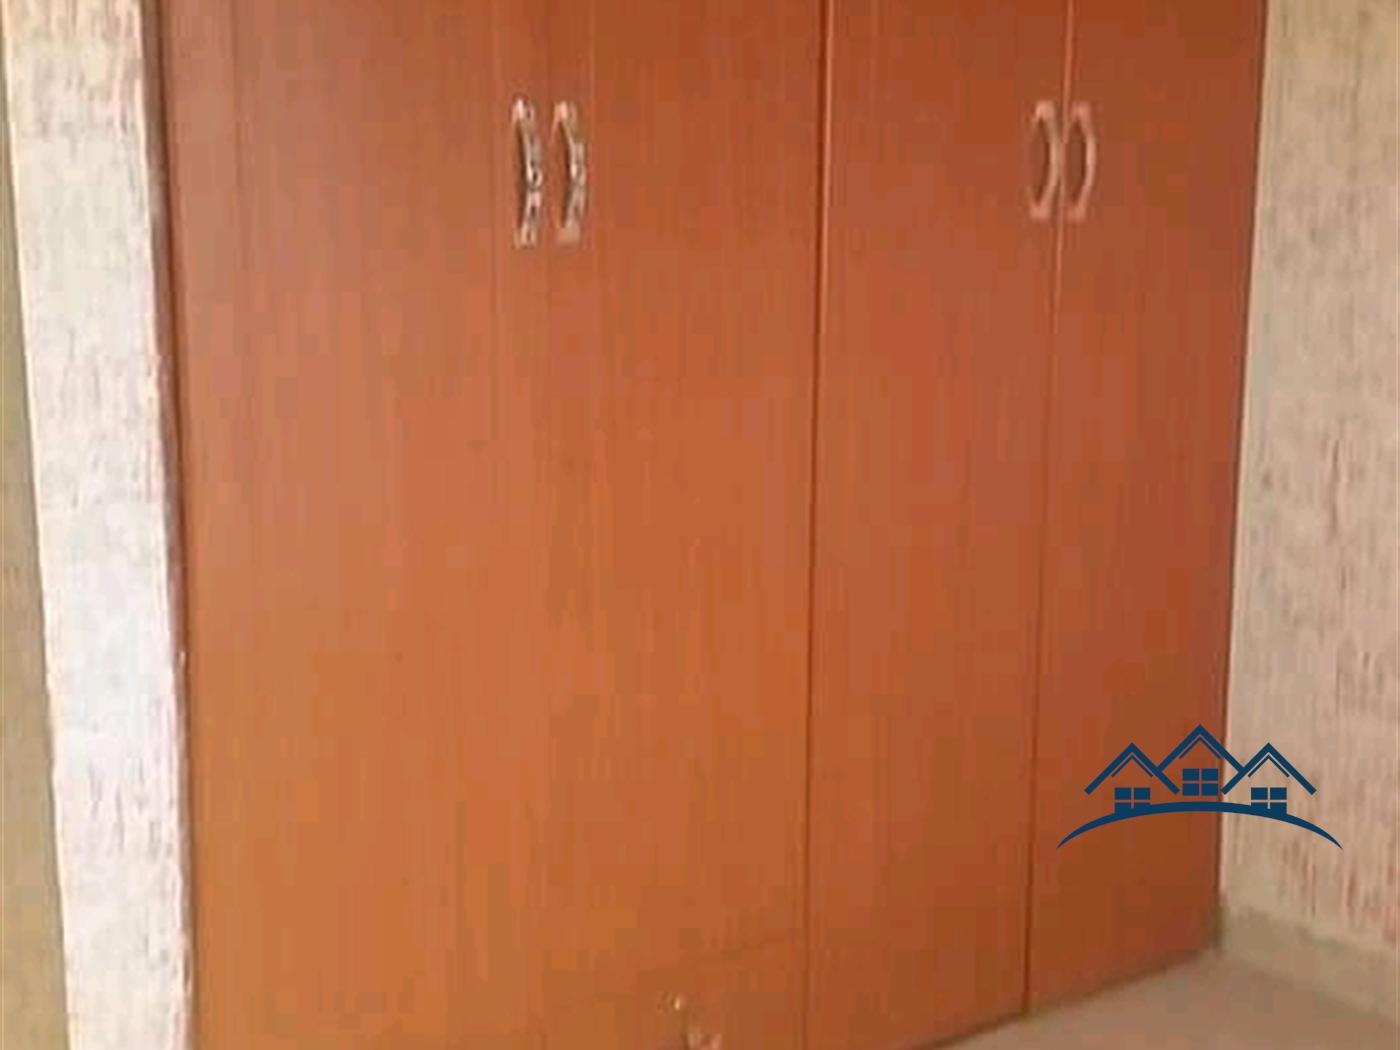 Rental units for rent in Seeta Mukono